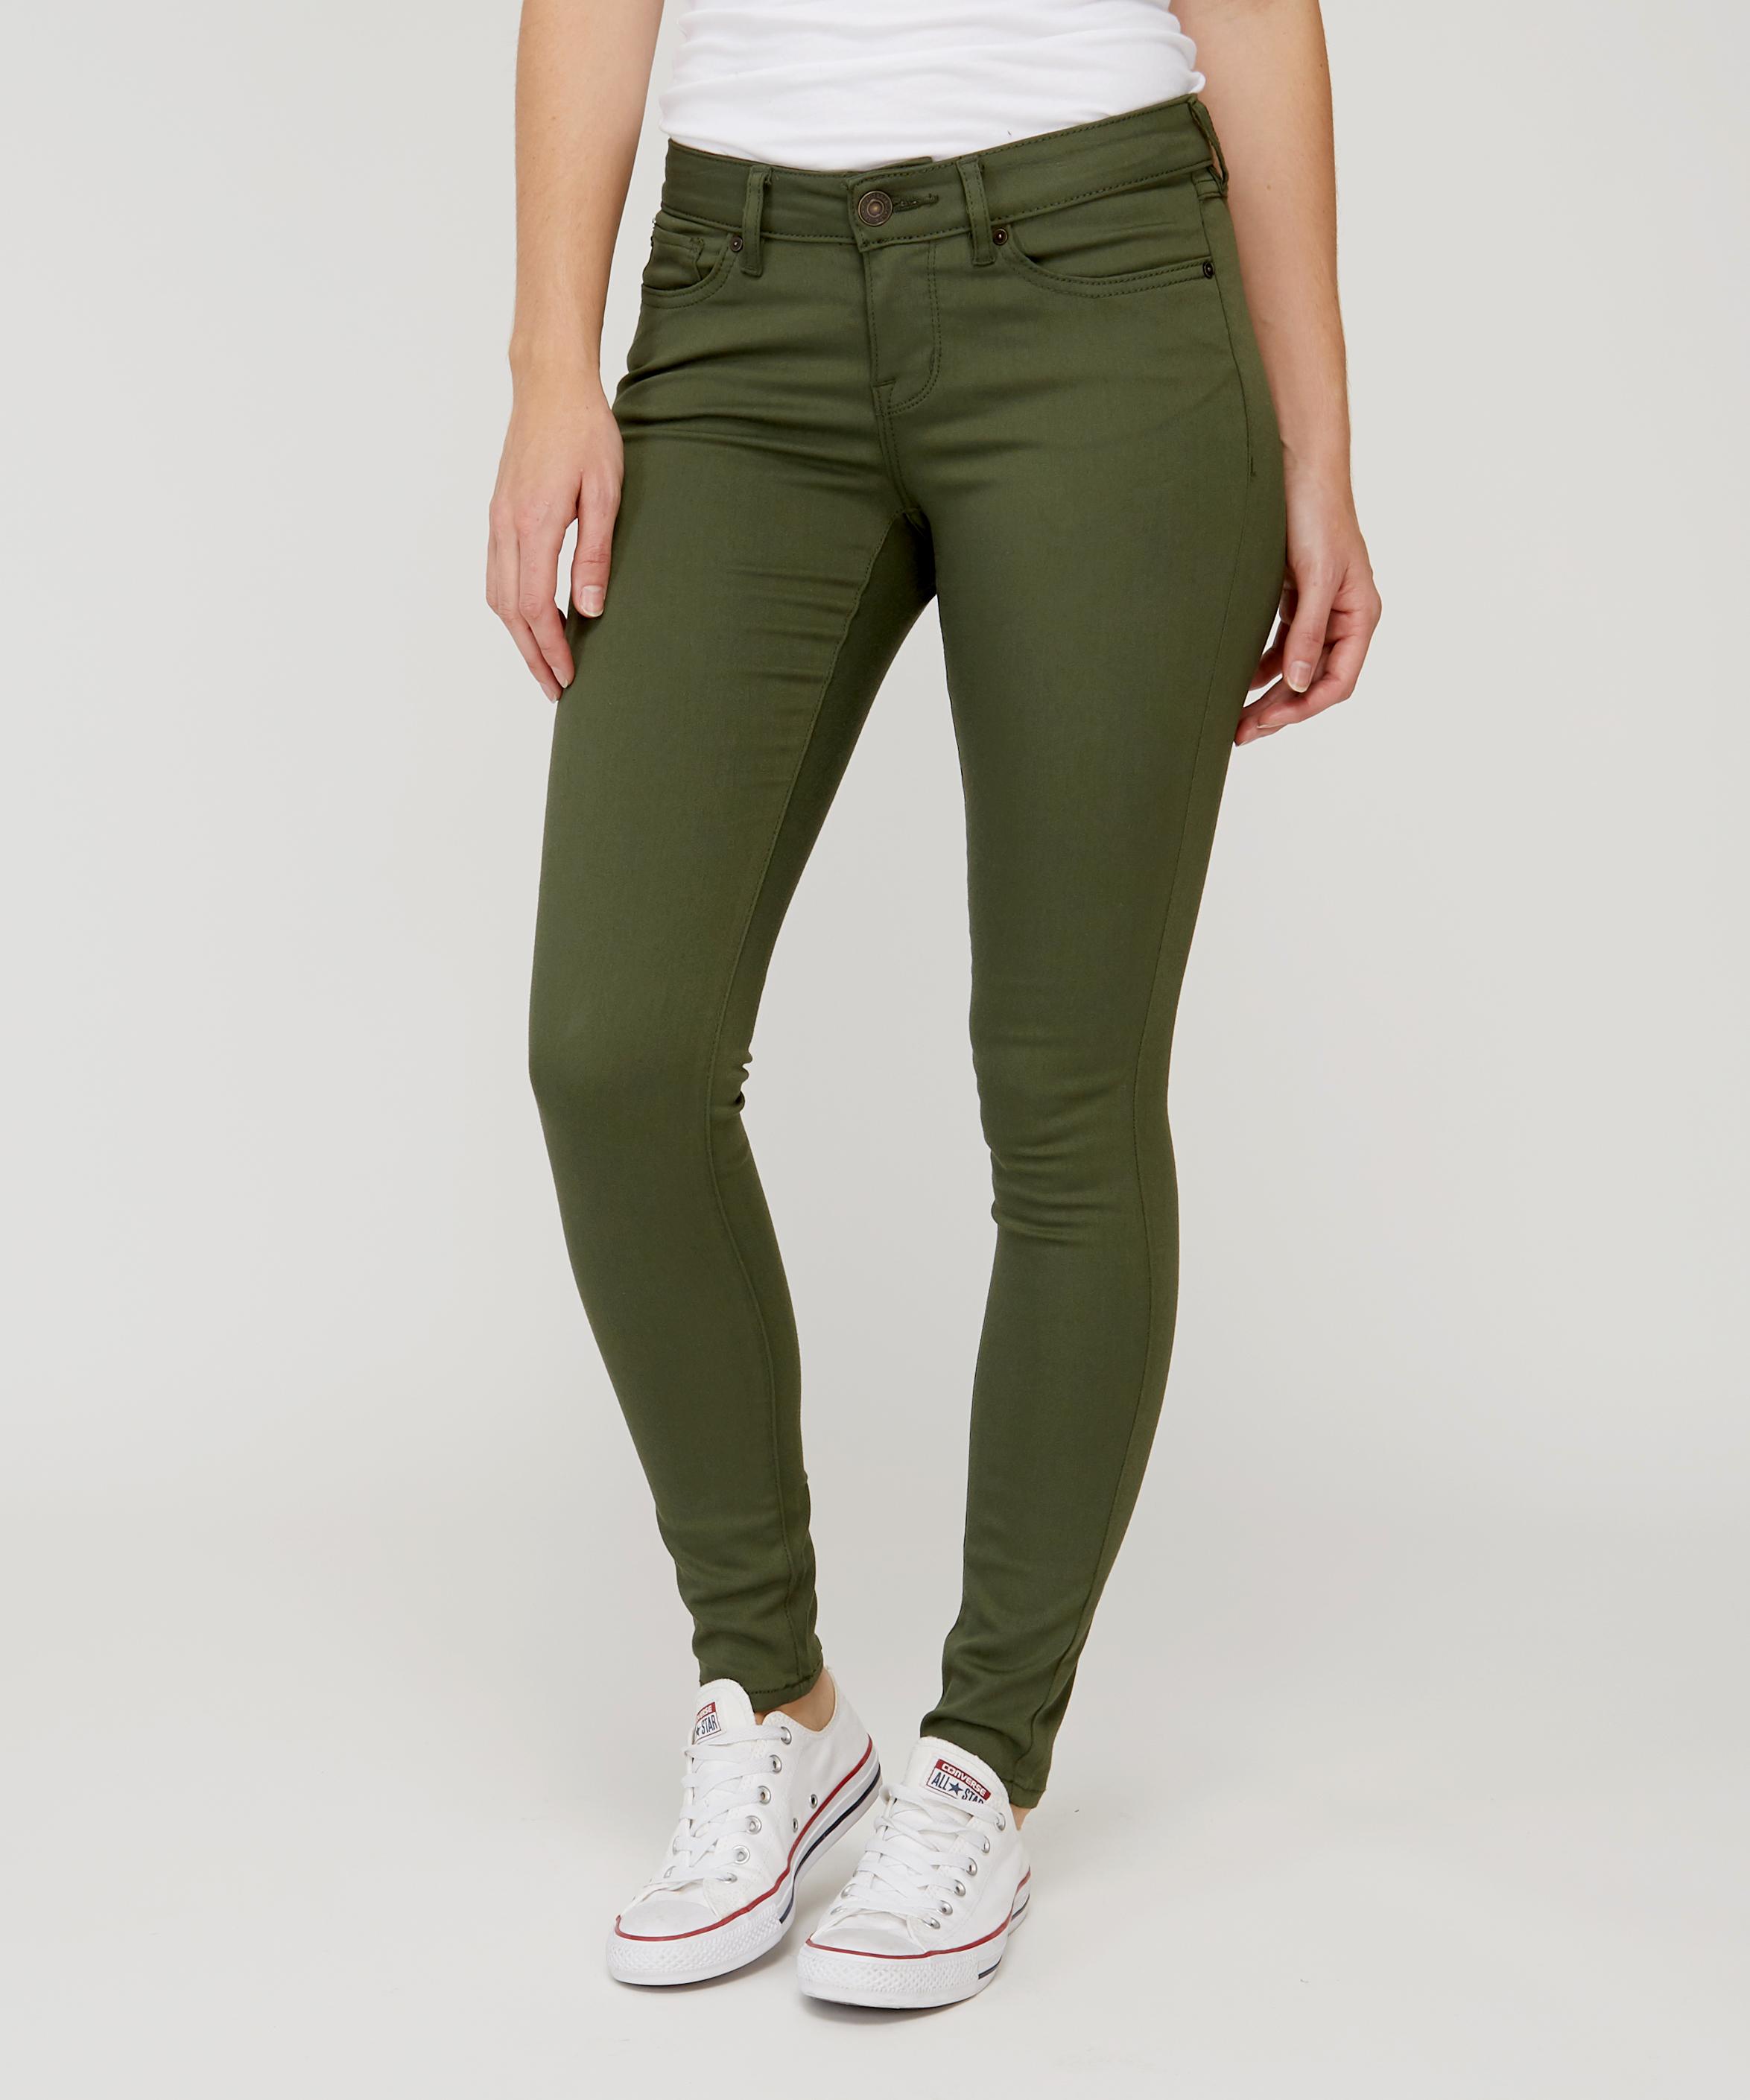 bfbfba45ab curvy skinny never fade military | bootlegger jeans